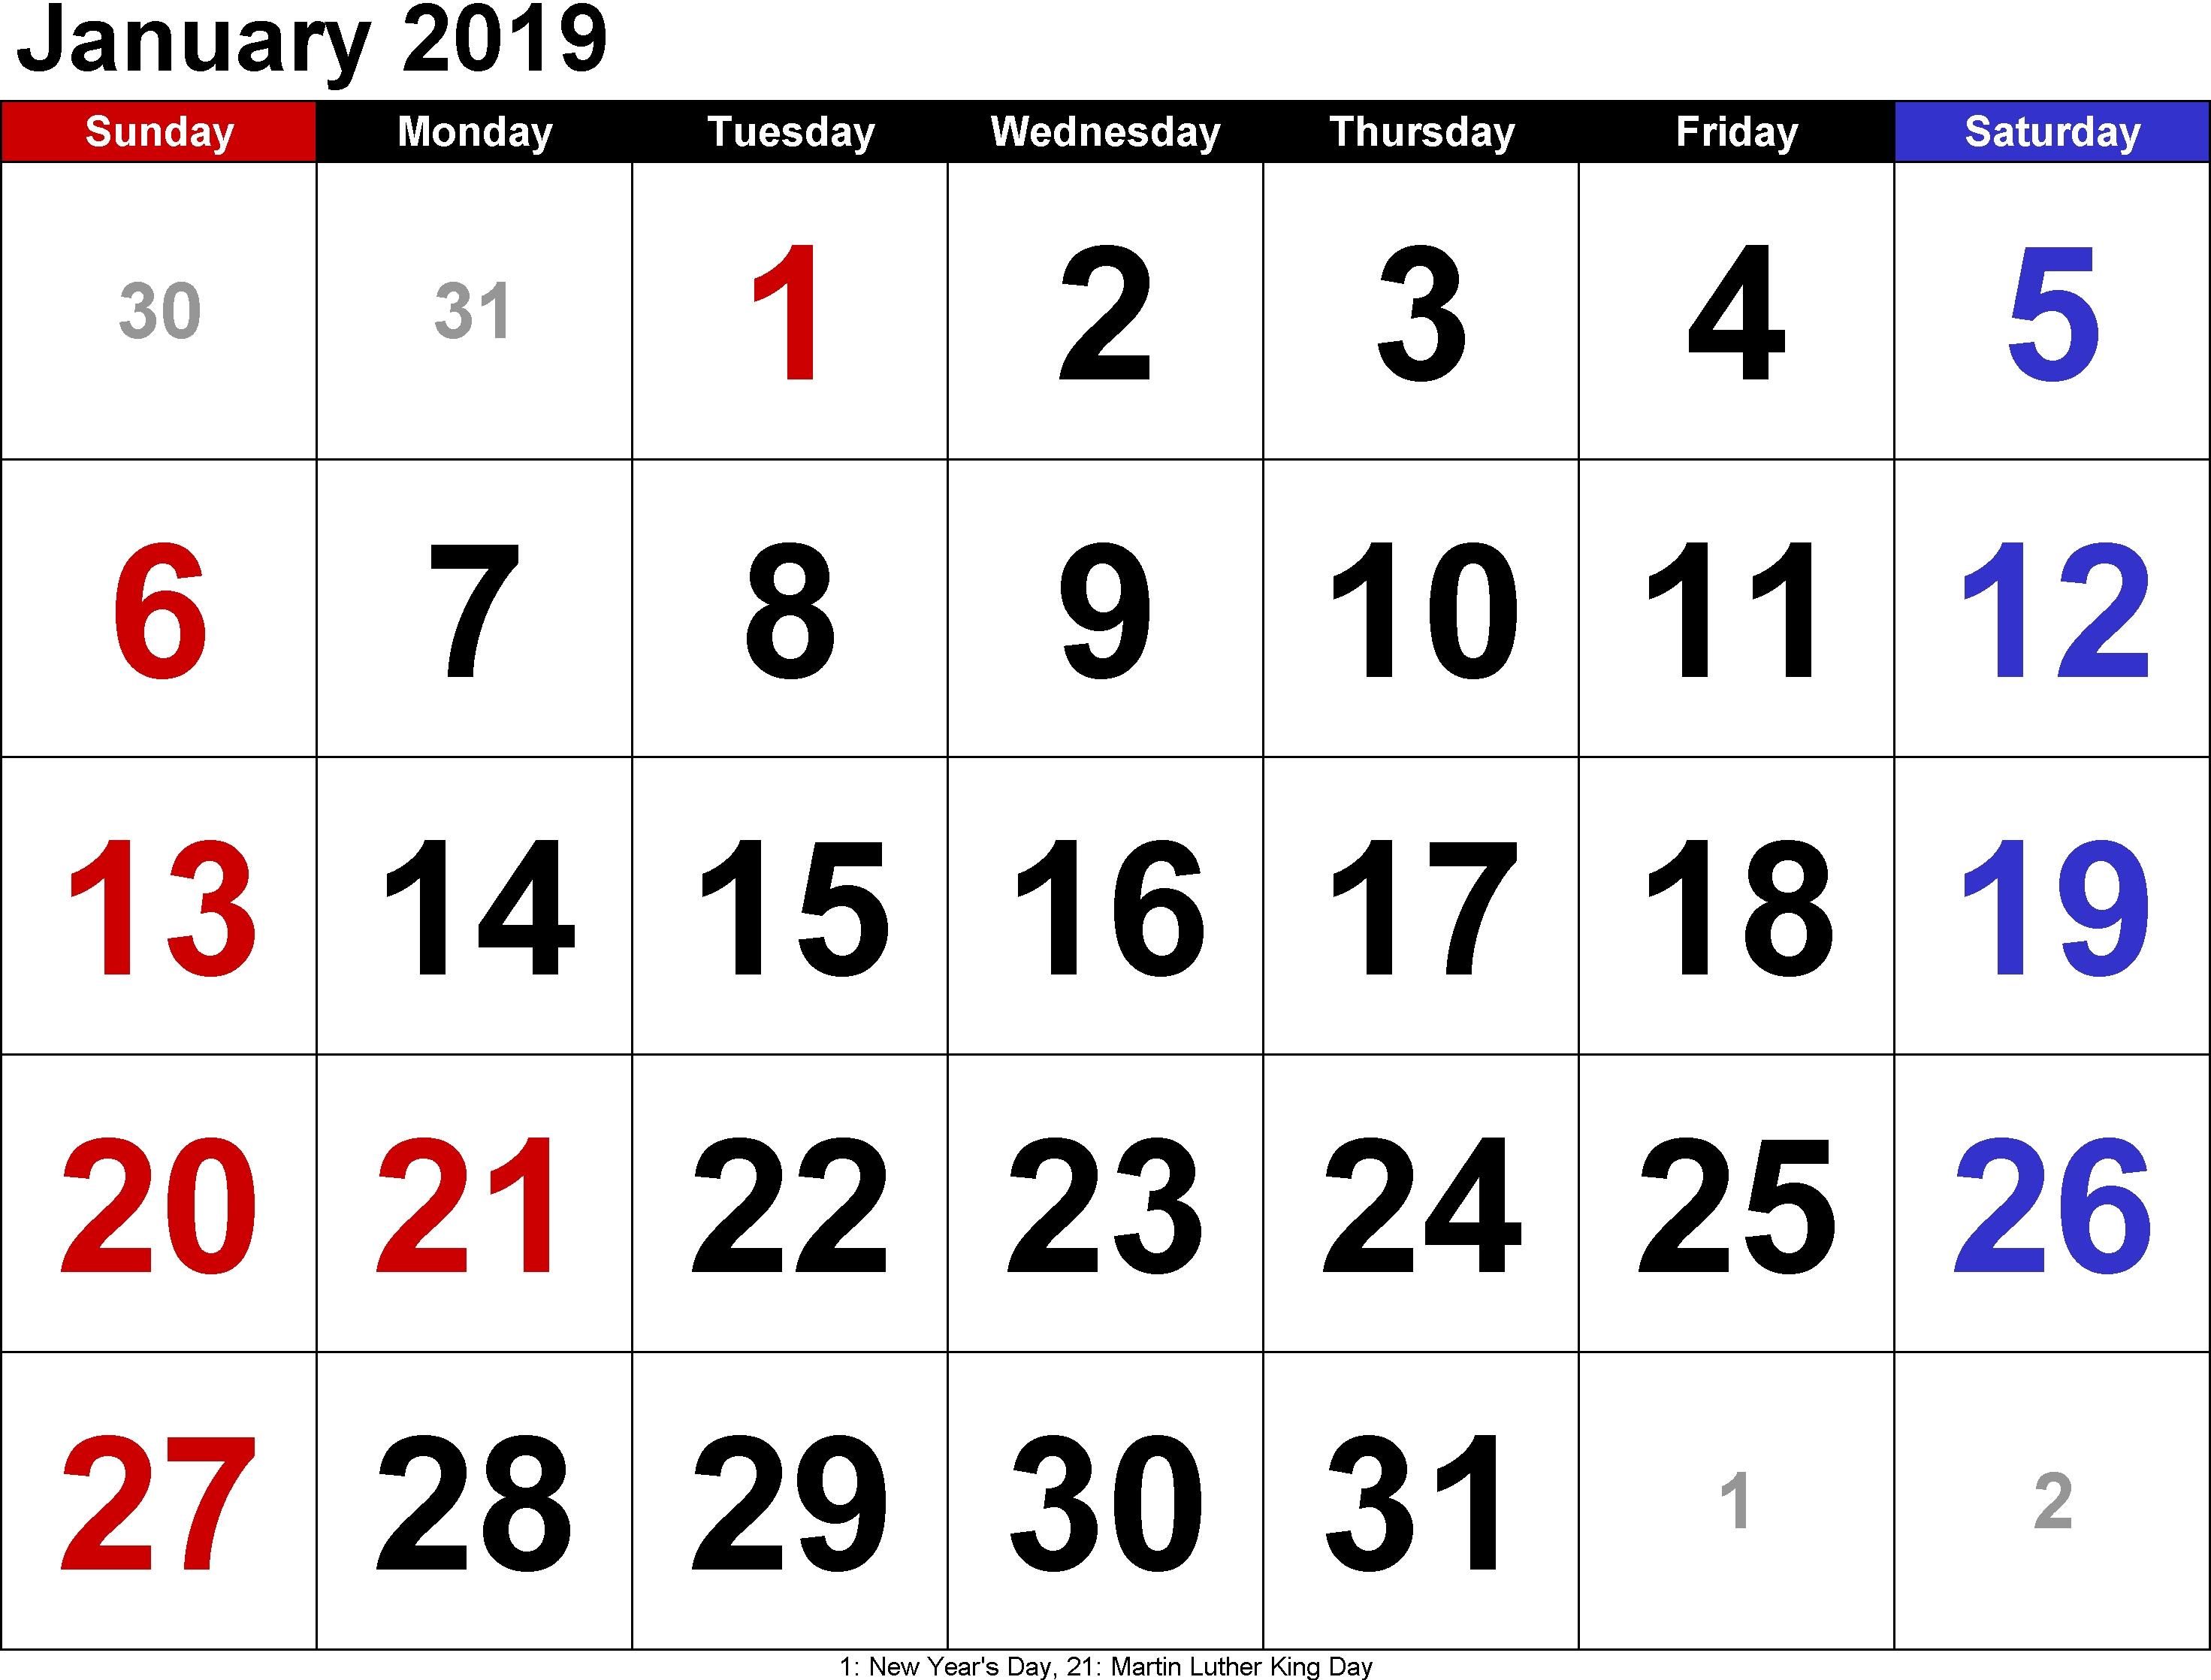 Free January Calendar 2019 | January 2019 Calendar | Pinterest Jan 4 2019 Calendar